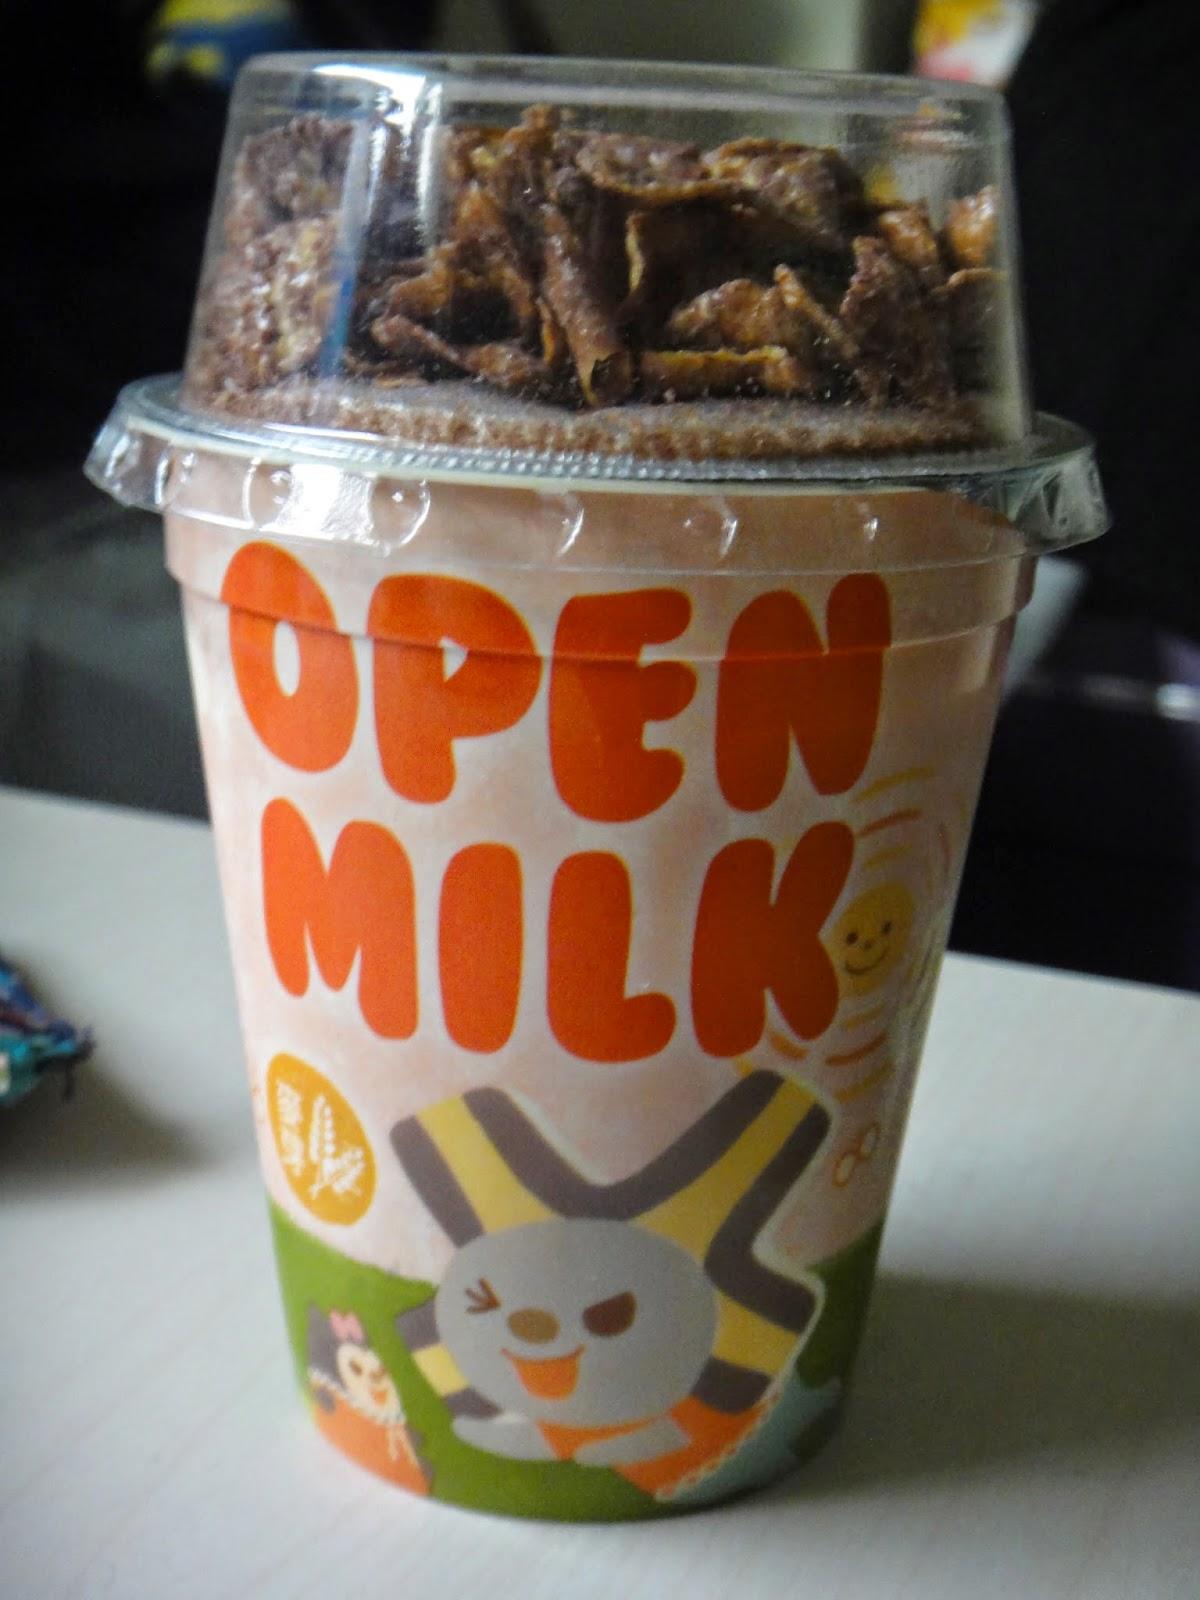 Taiwan Open Milk Instant Cereal 7-11